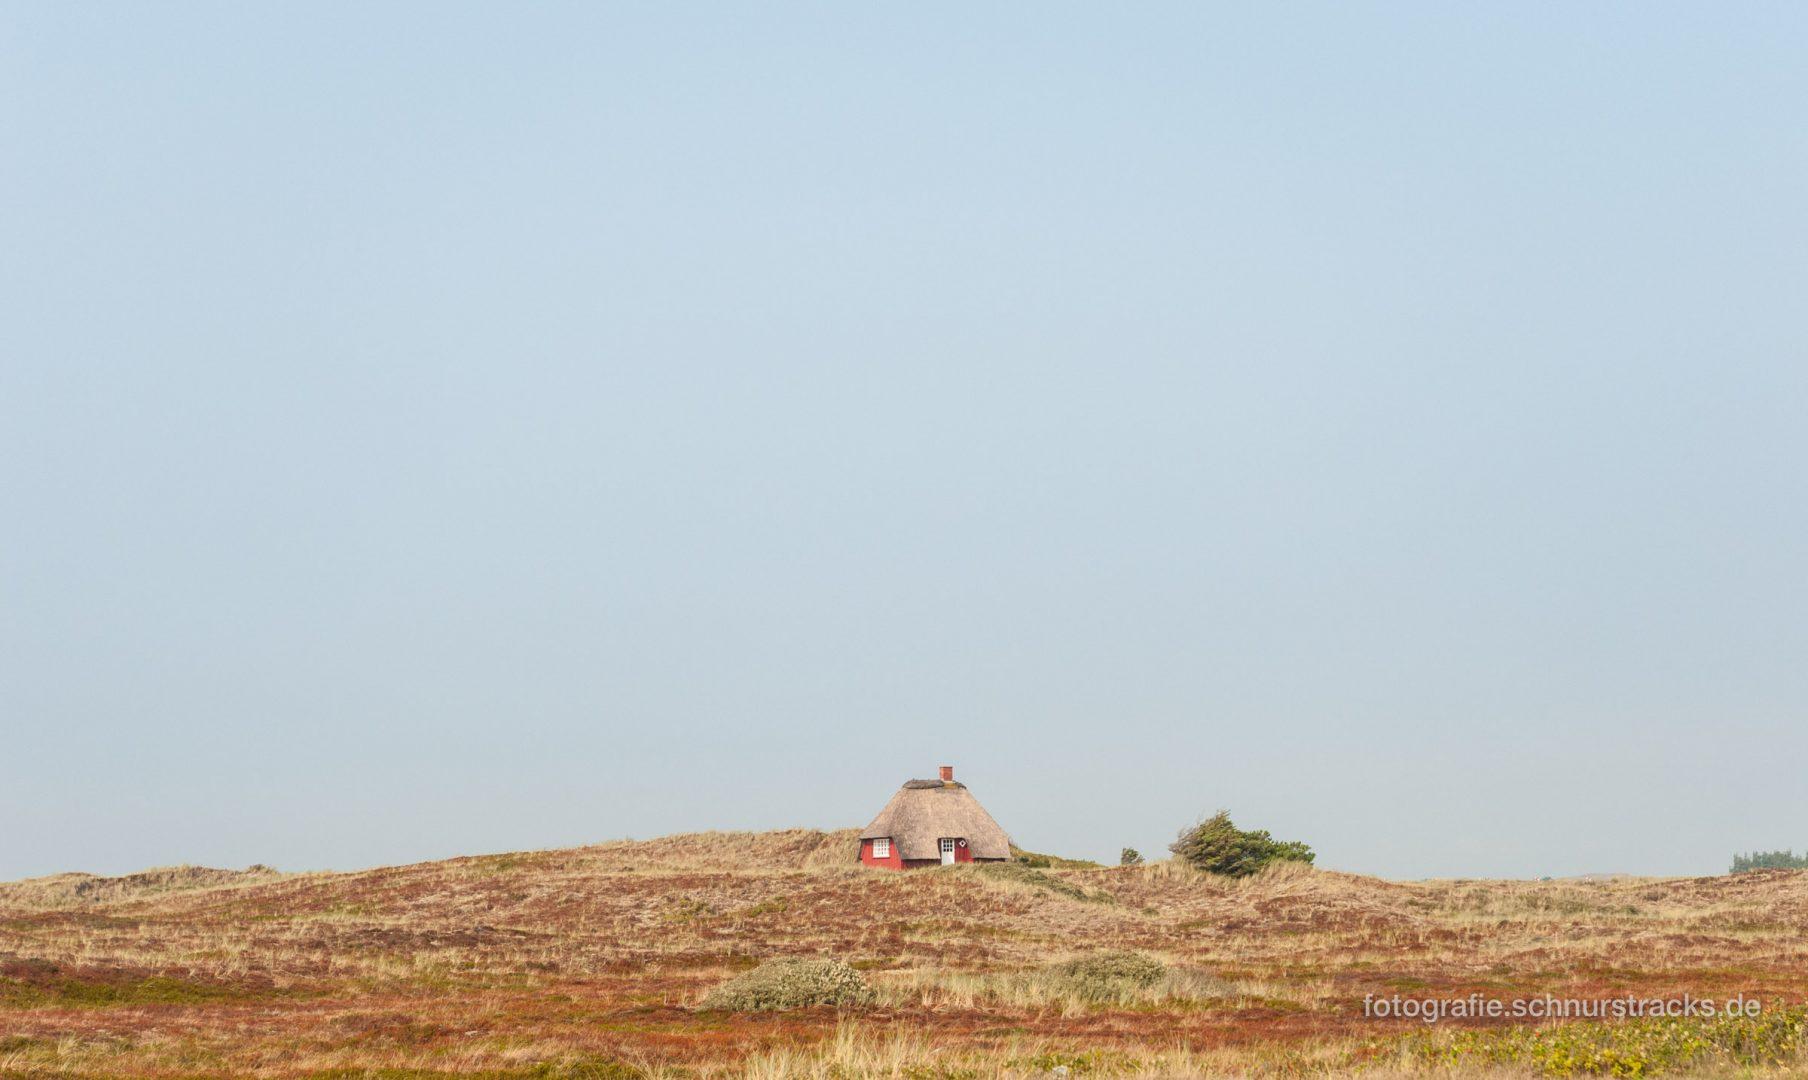 Ferienhaus in den Dünen – Westjütland